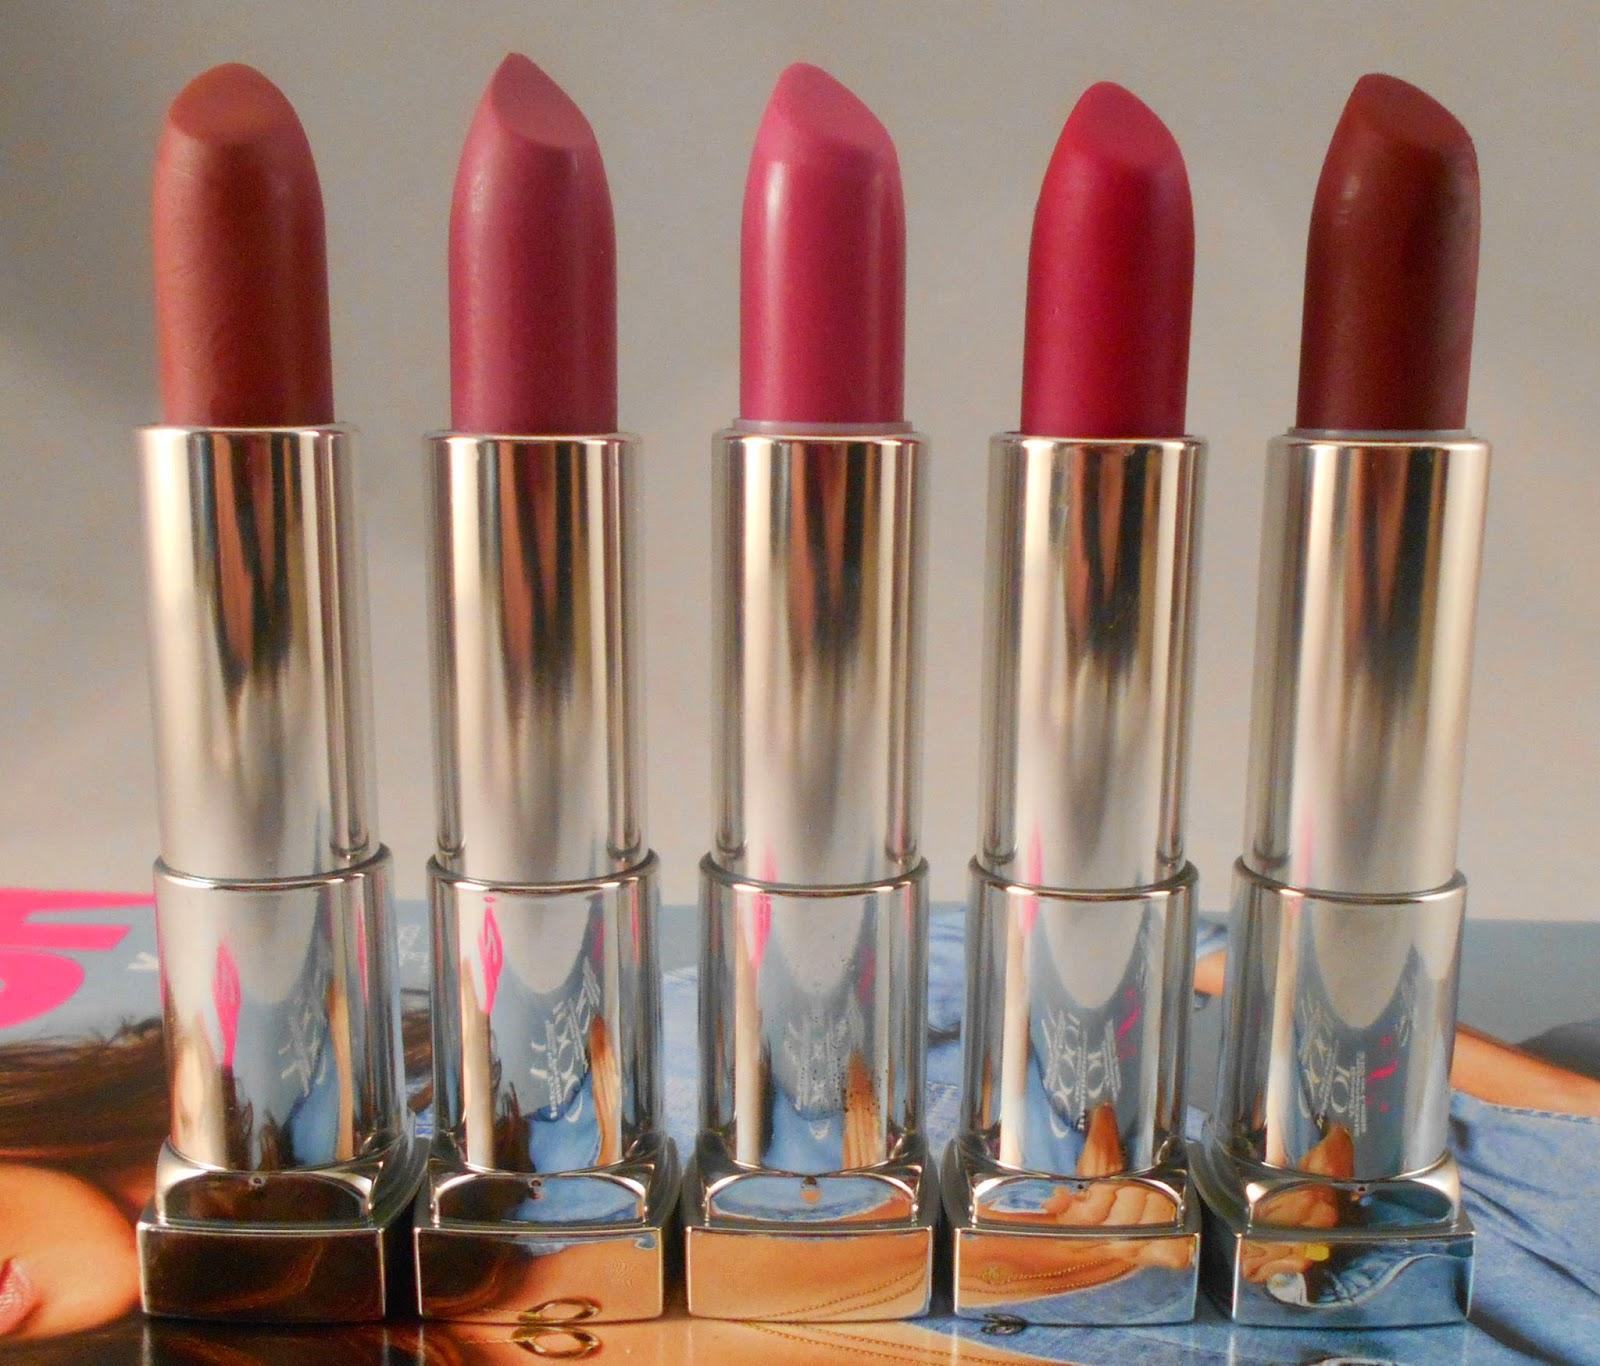 Maybelline Color Sensational Creamy Mattes Lipsticks